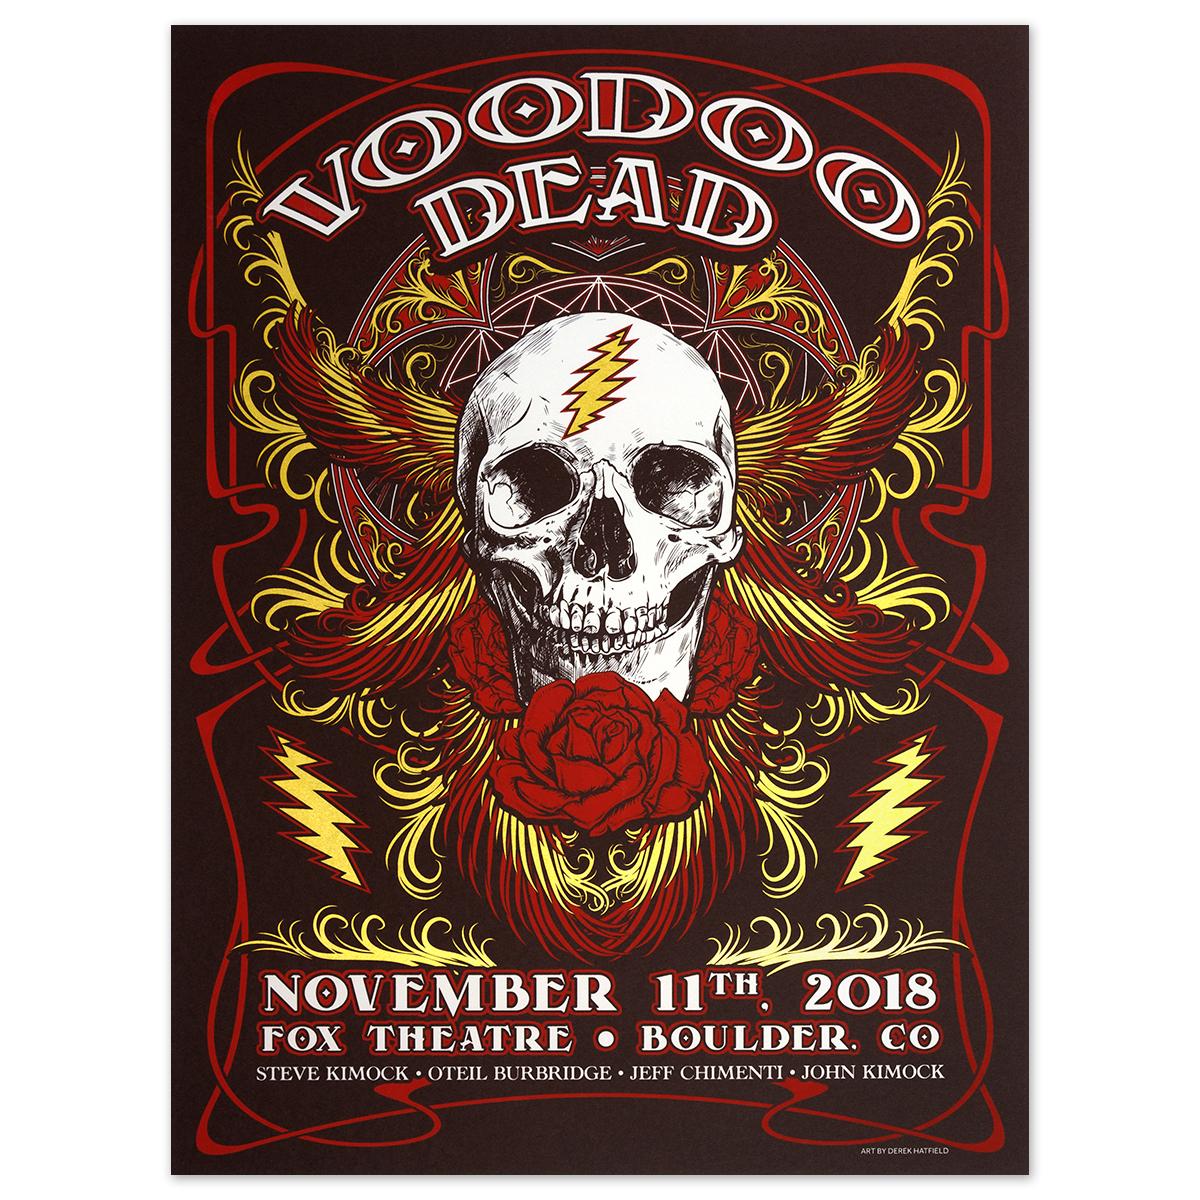 VOODOO DEAD at The Fox, Boulder, CO Nov. 11th, 2018